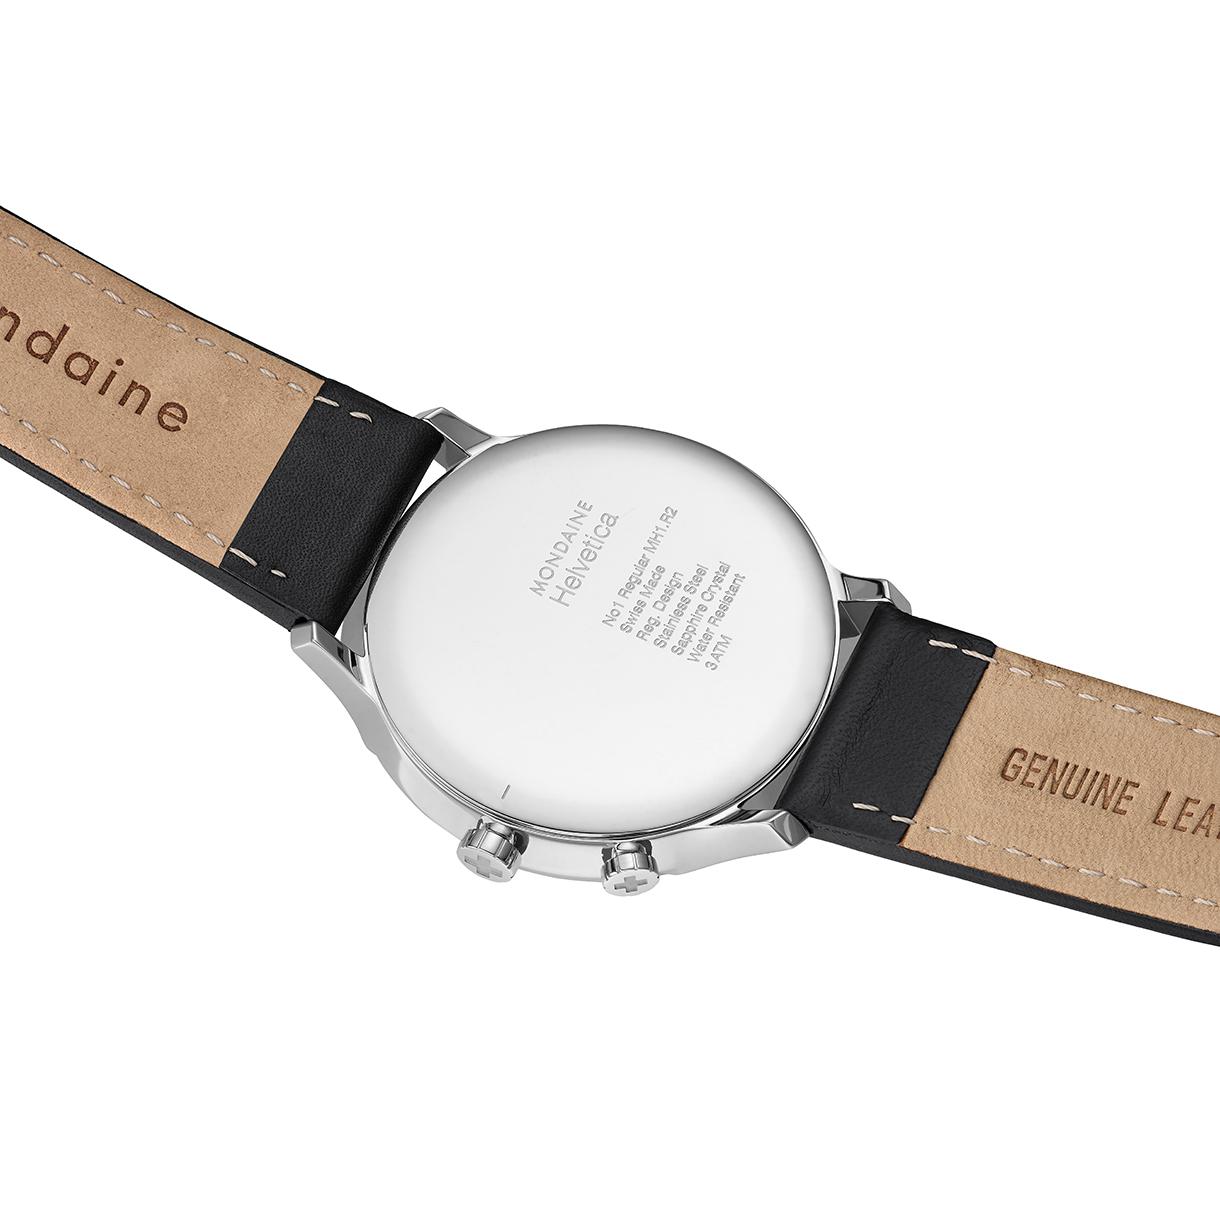 Mondaine helvetica 2nd time zone mondaine helvetica watches clocks - Mondaine travel clock ...